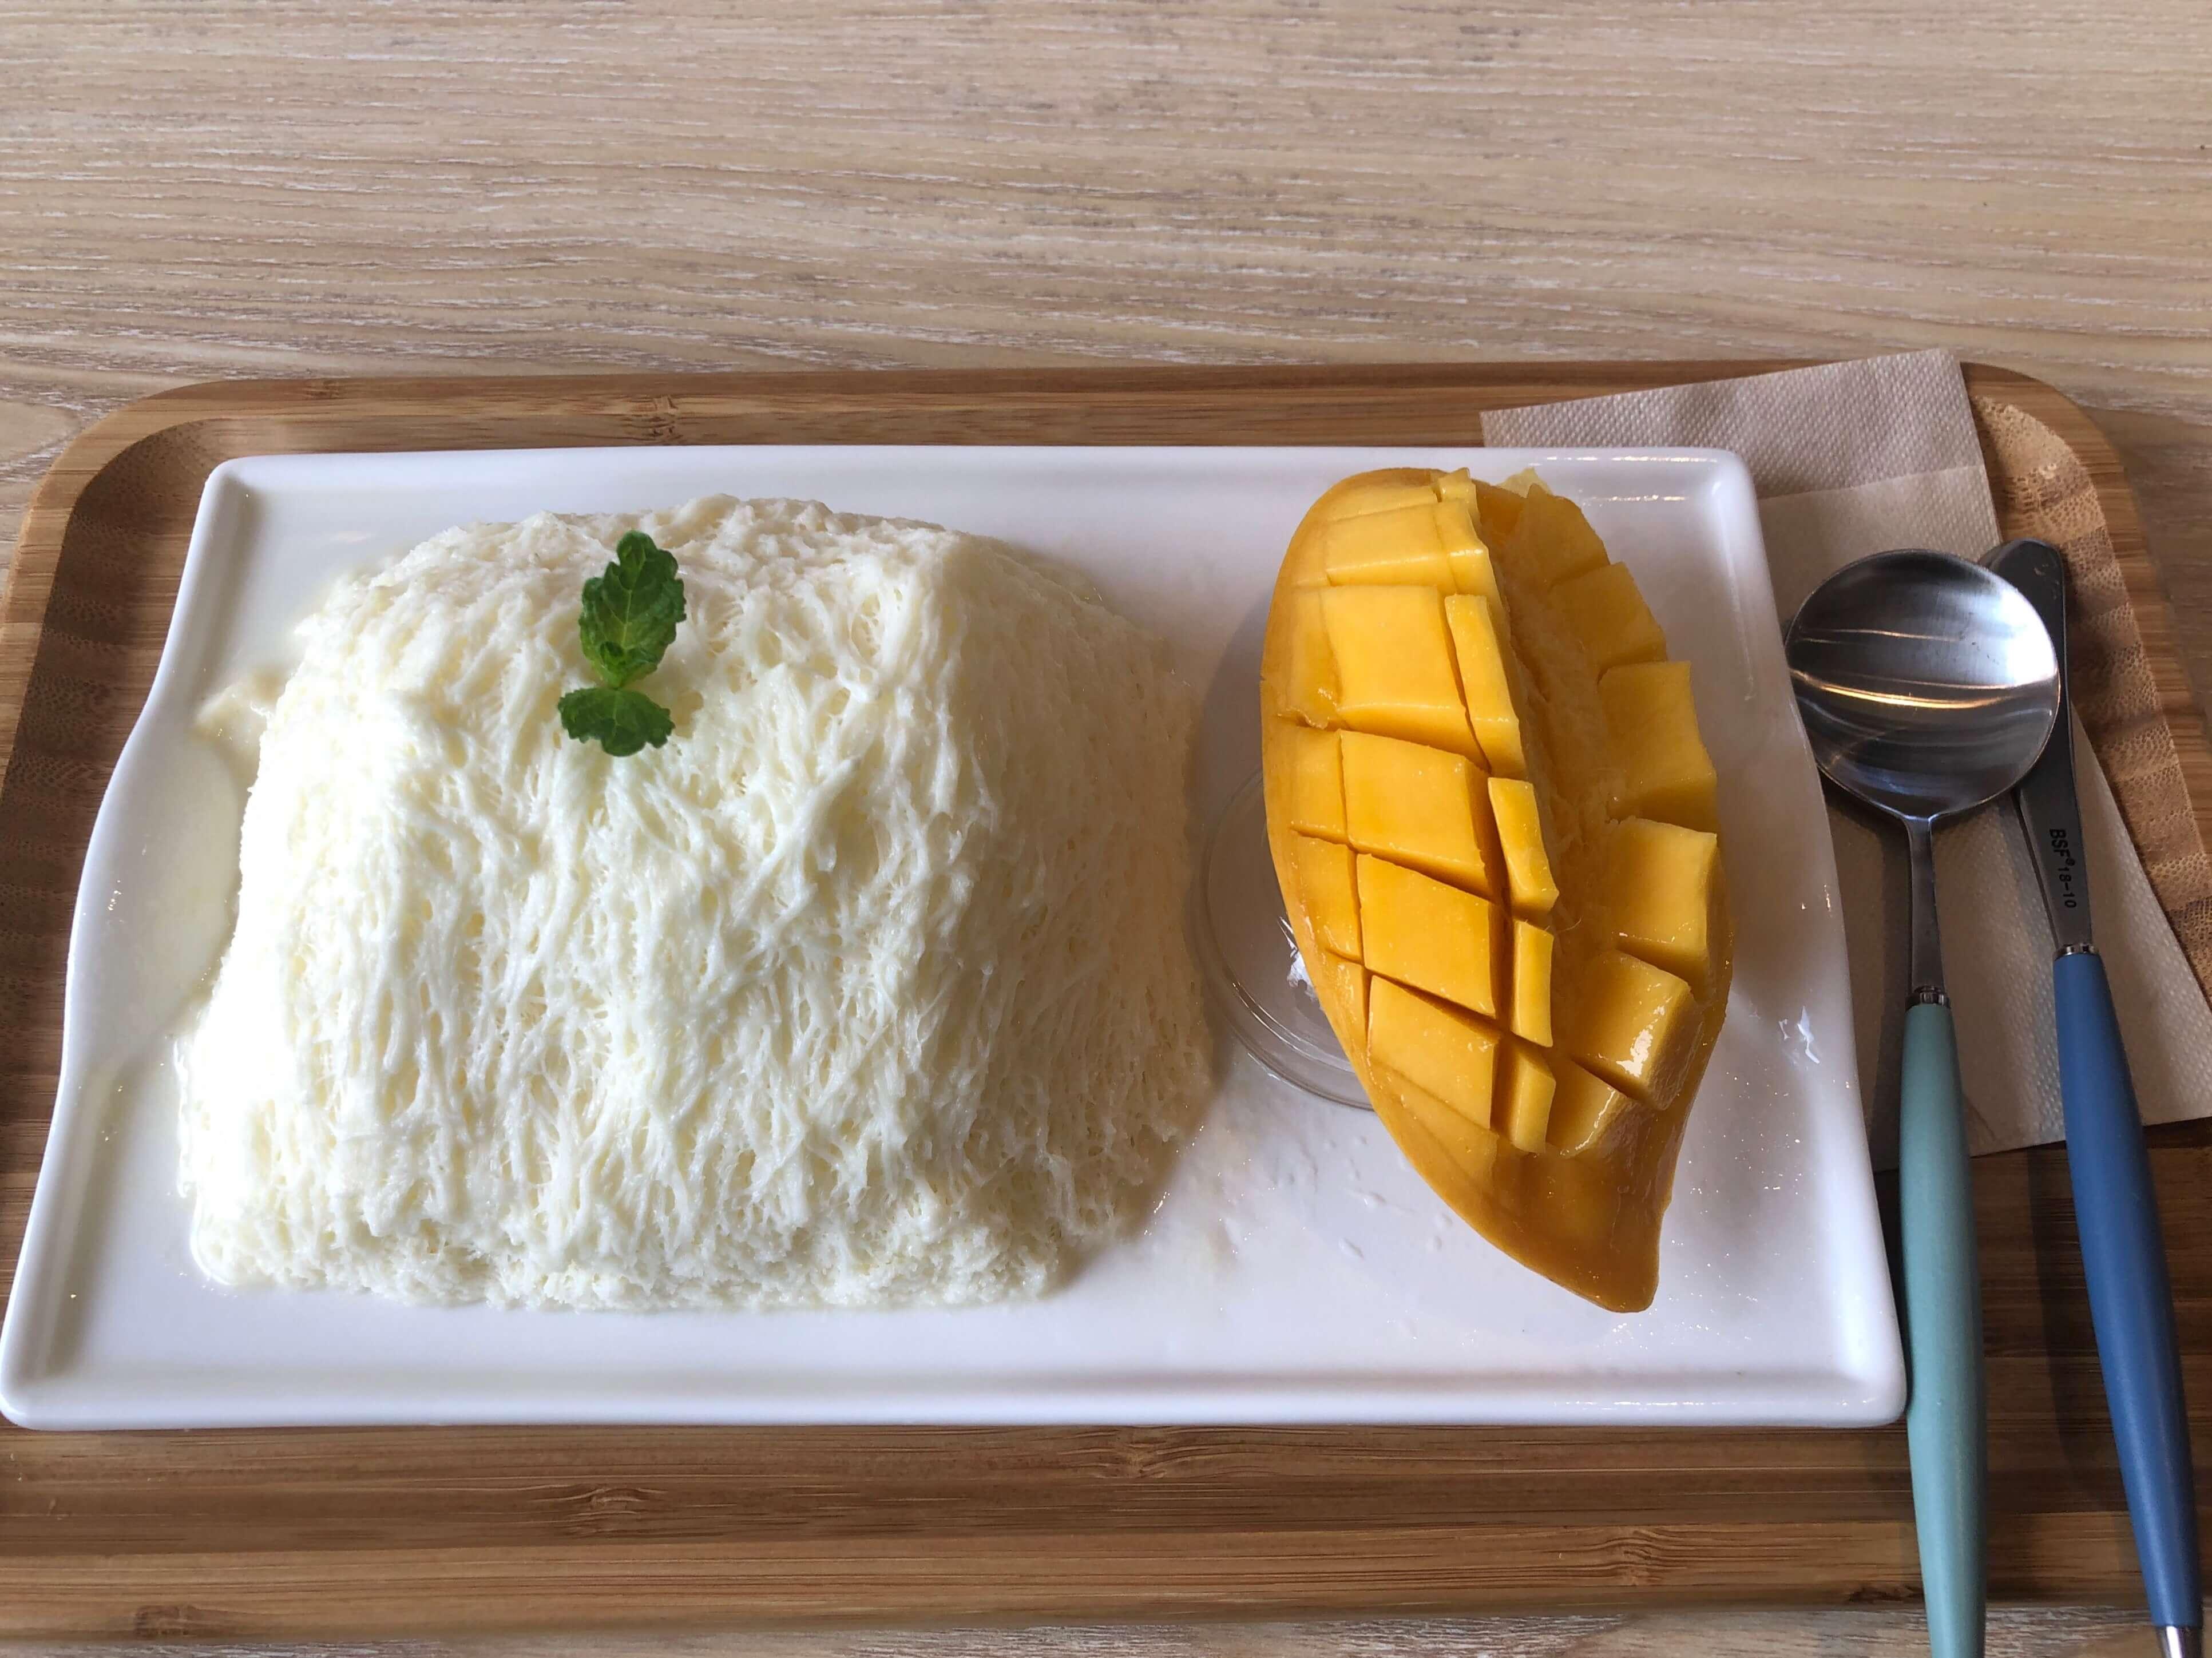 SeoulCafé ソウルカフェ 新大久保 かき氷 スイーツ Shinokubo shavedice sweets3